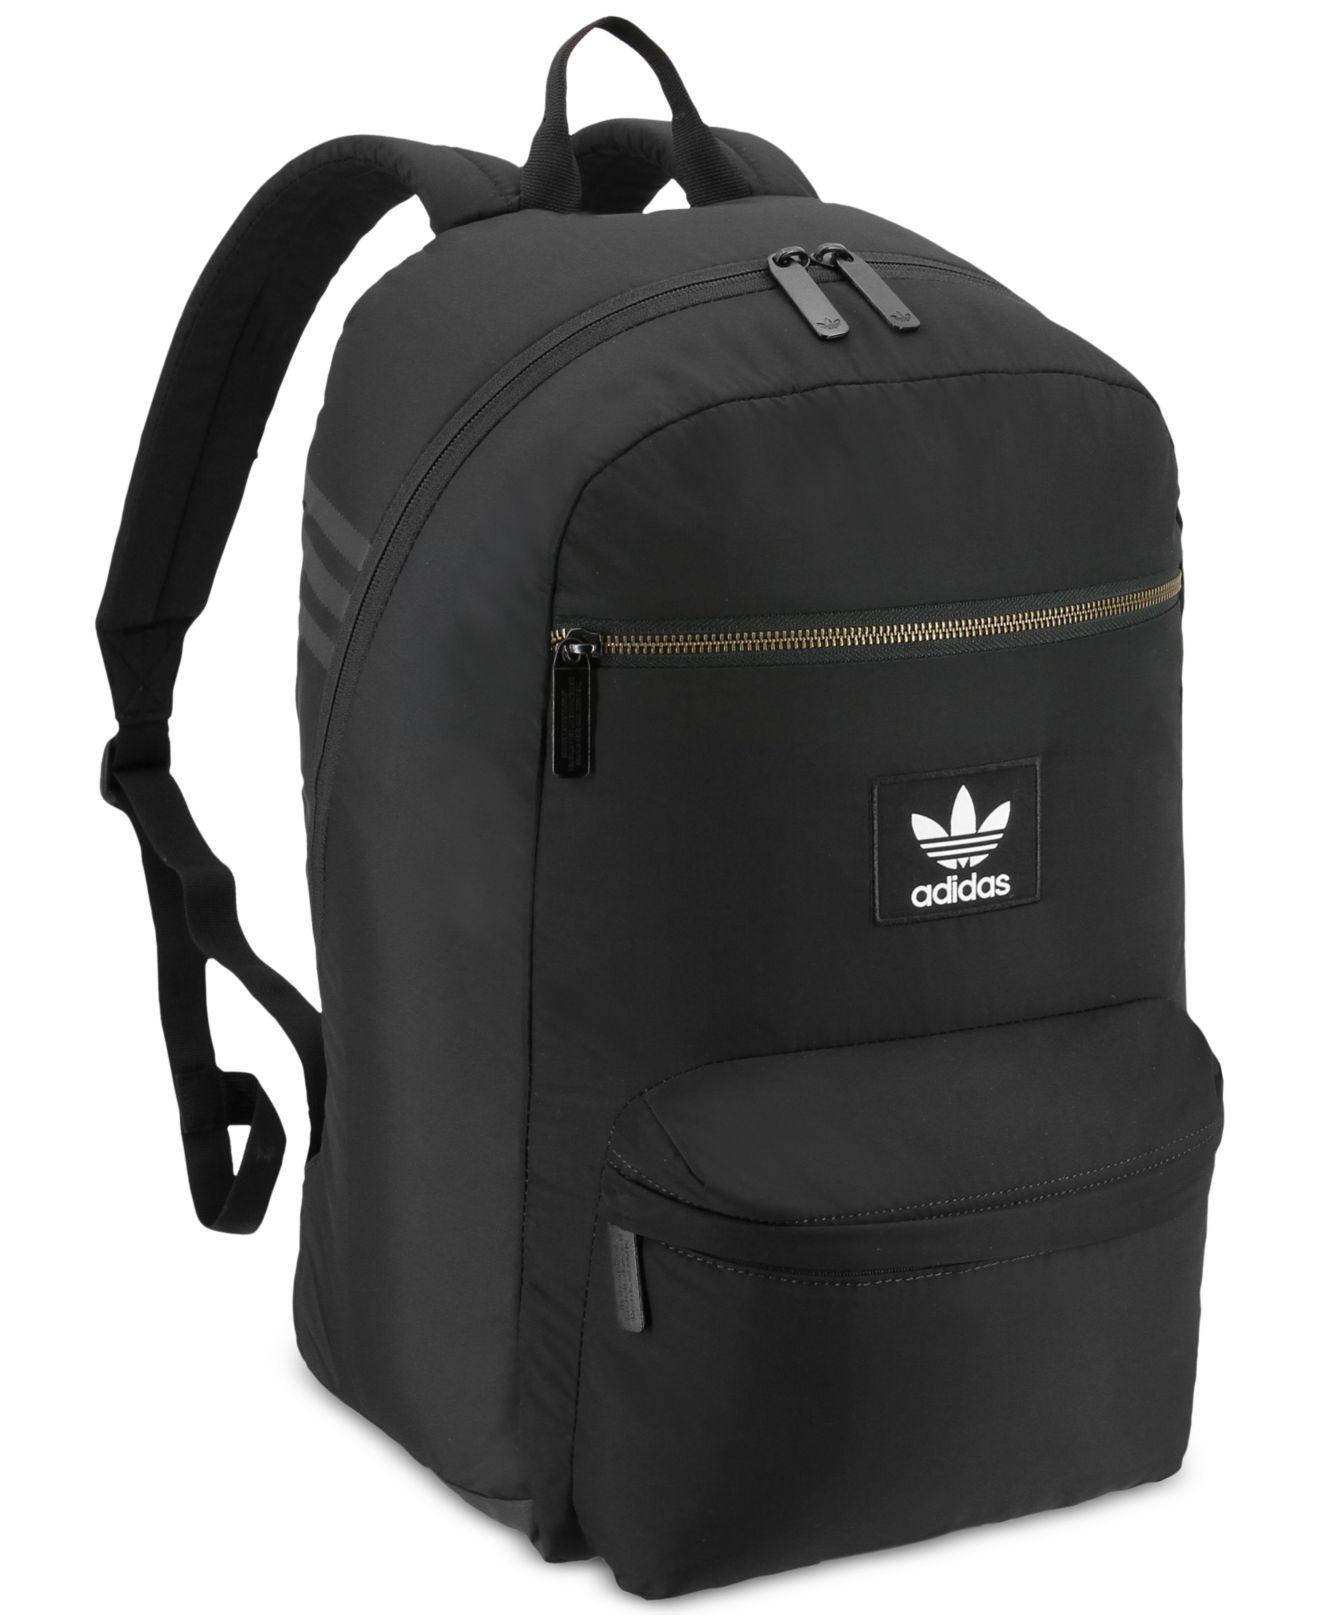 f3663f0a233a Adidas - Black Originals National Plus Backpack for Men - Lyst. View  fullscreen